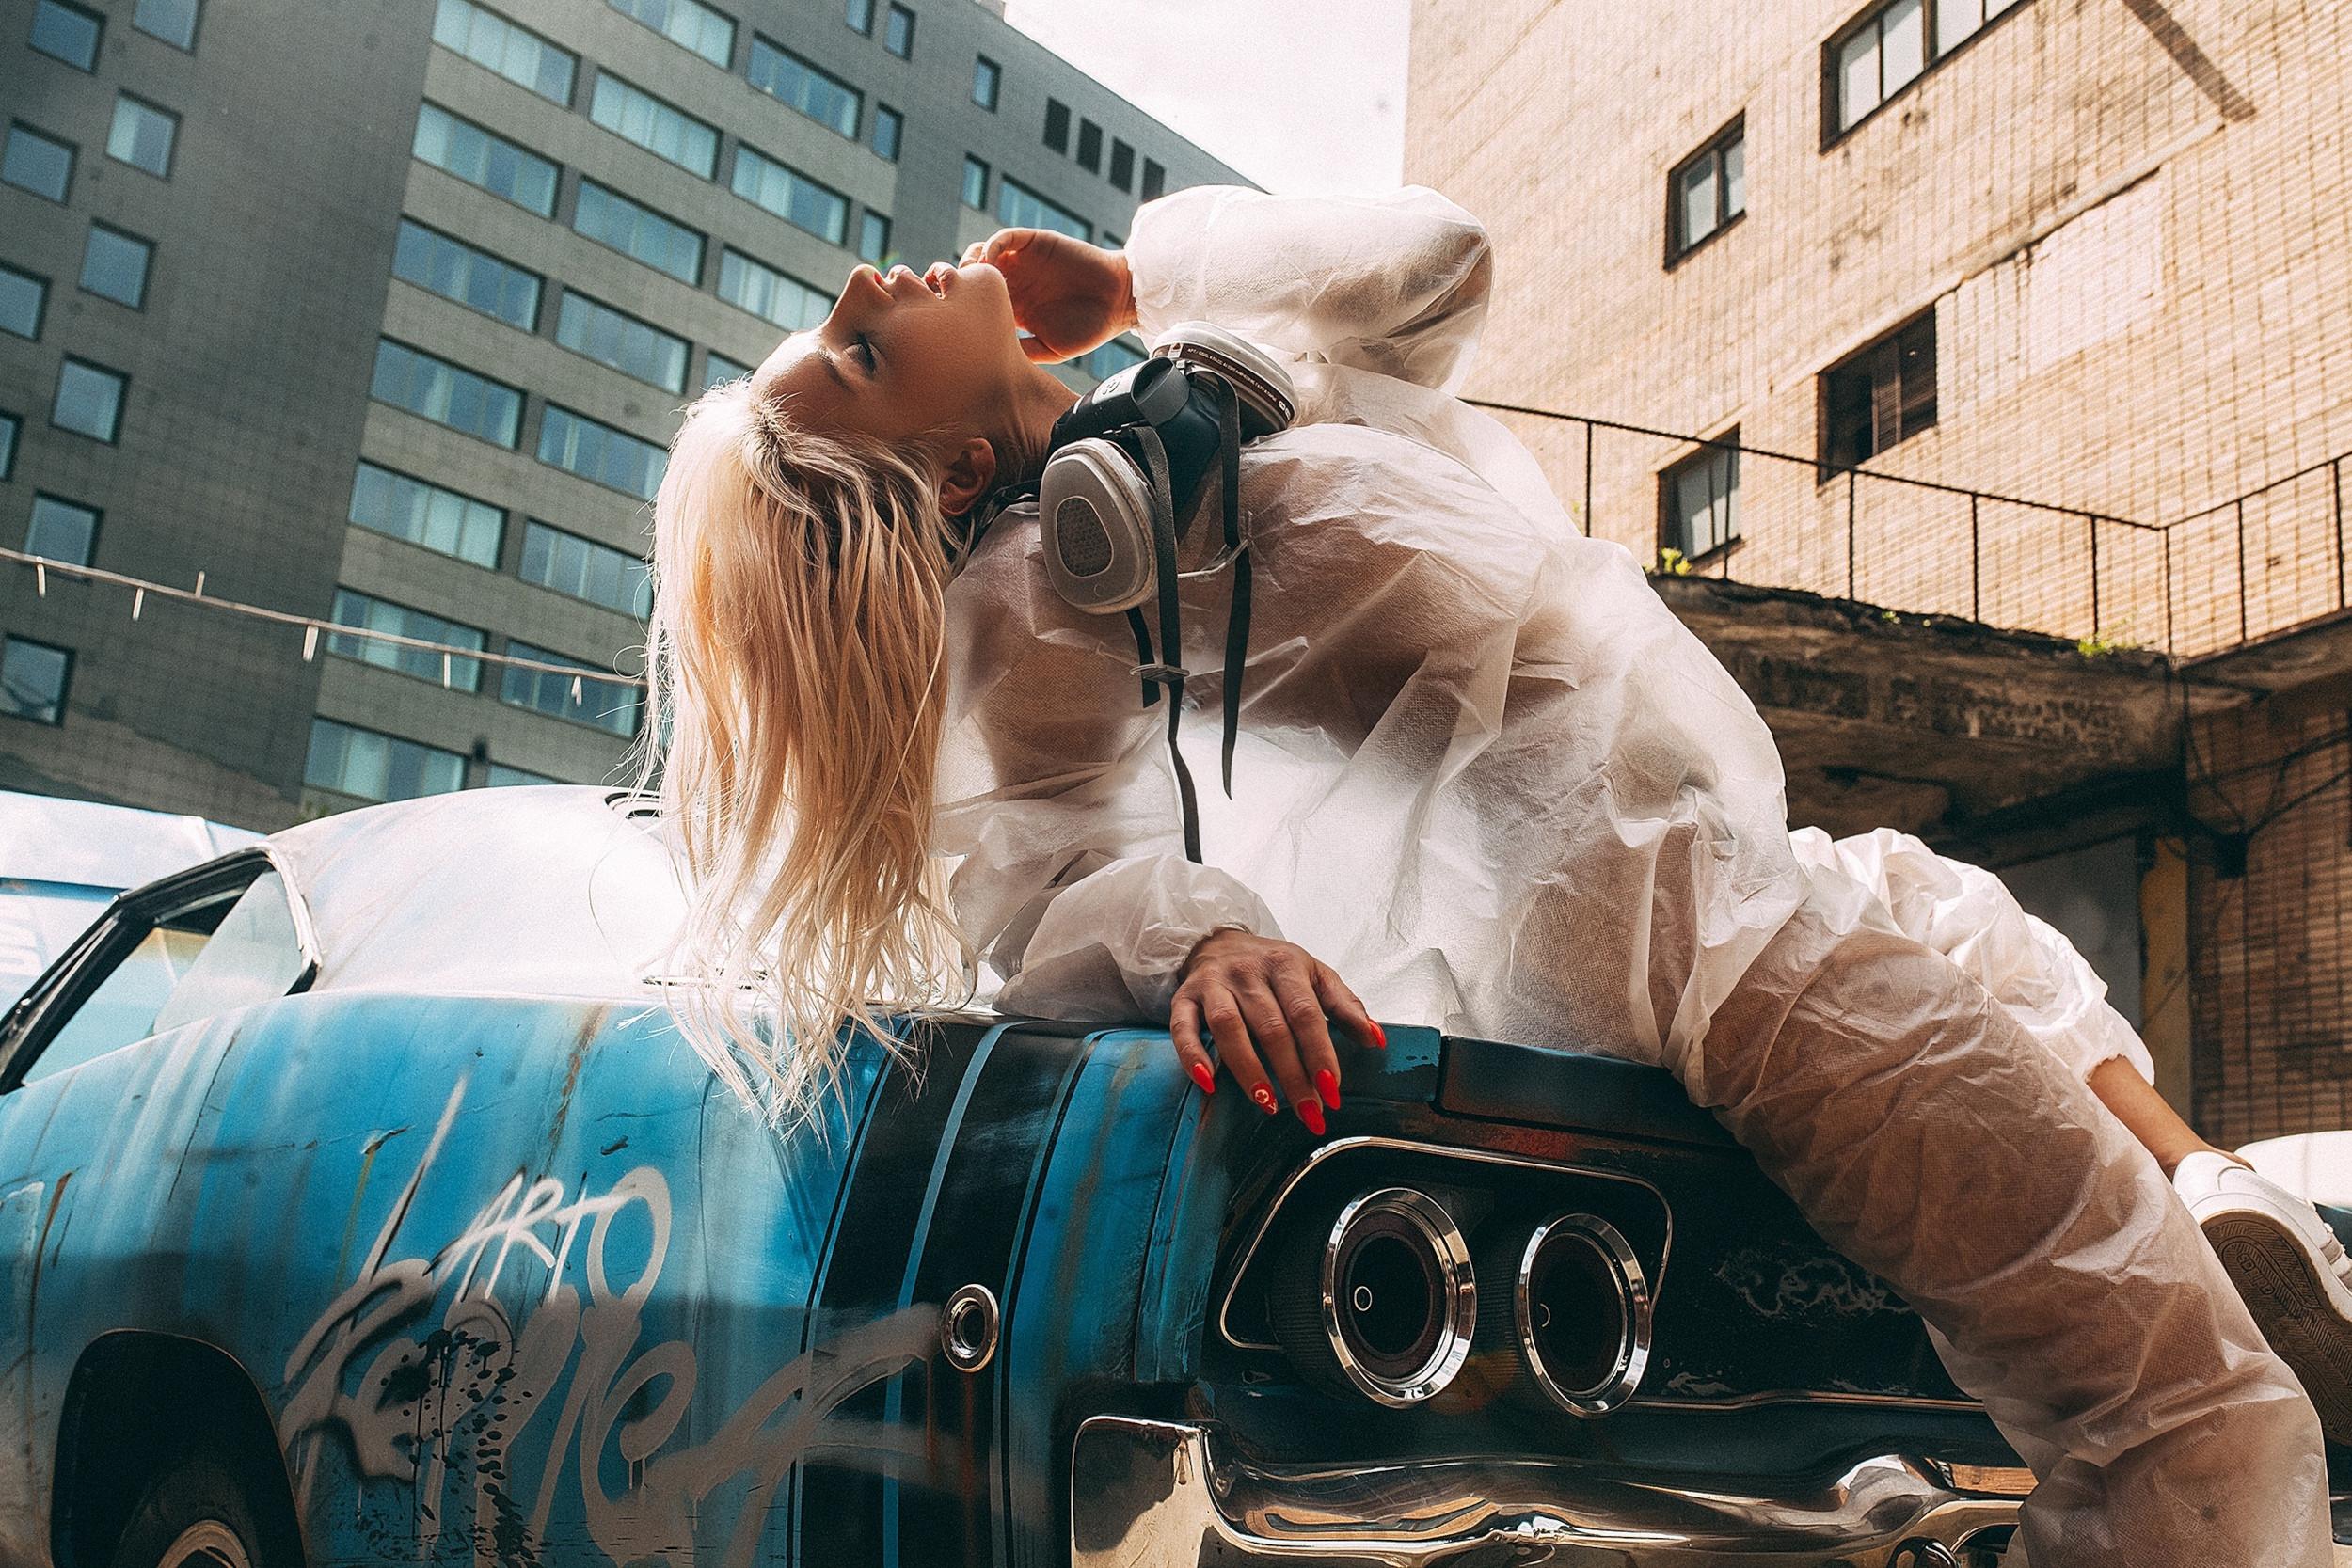 Julia Abramova by Roma Roma 30 fappenings.com